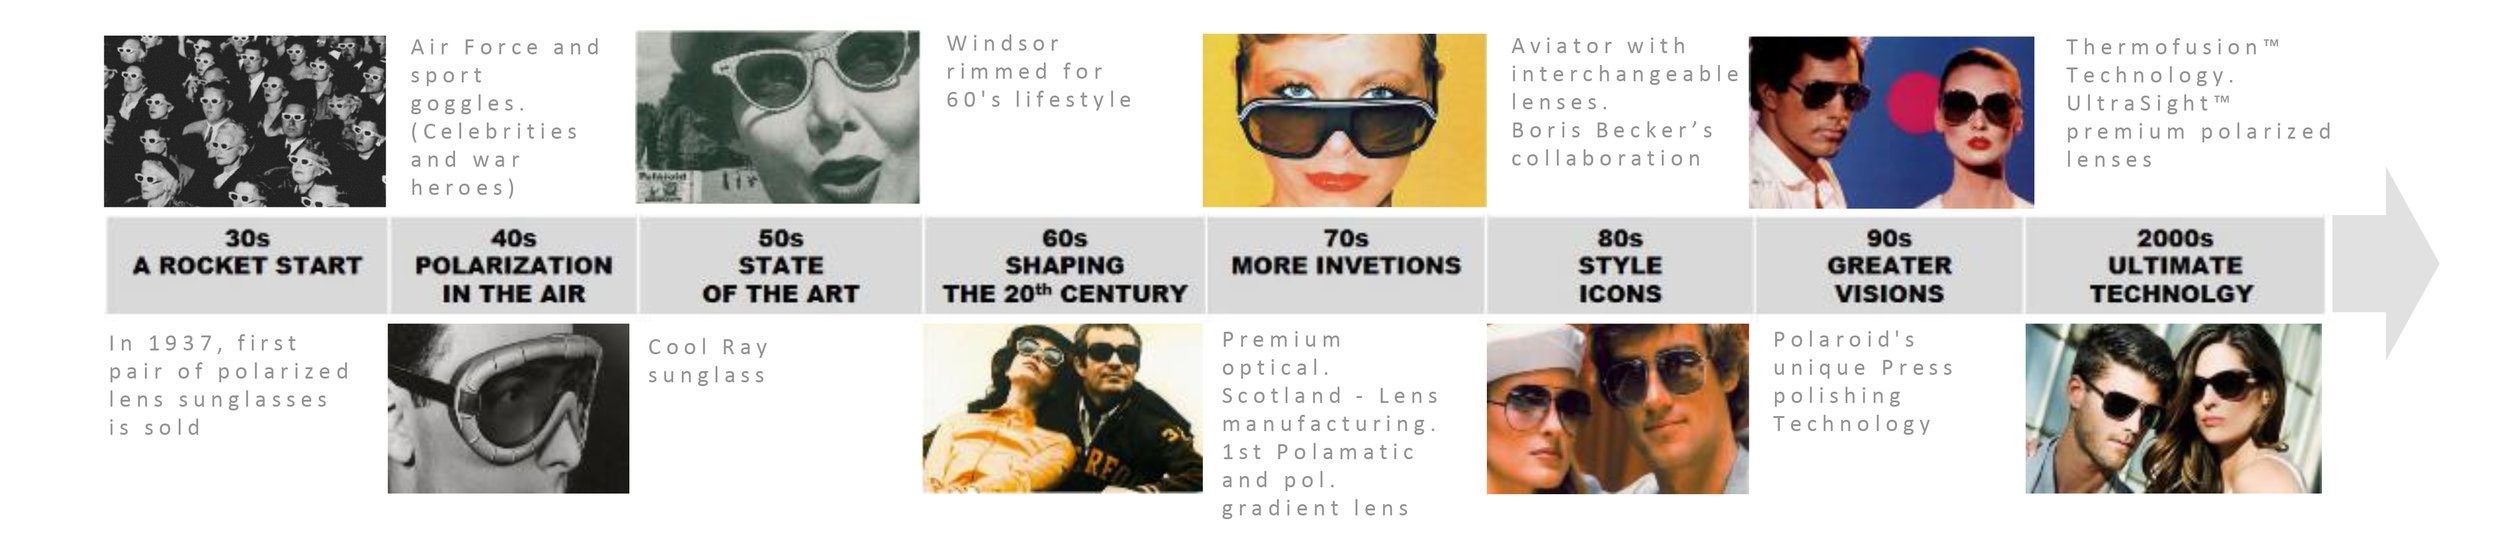 polaroid_timeline_scorpio-worldwide_travel-retail-distributor